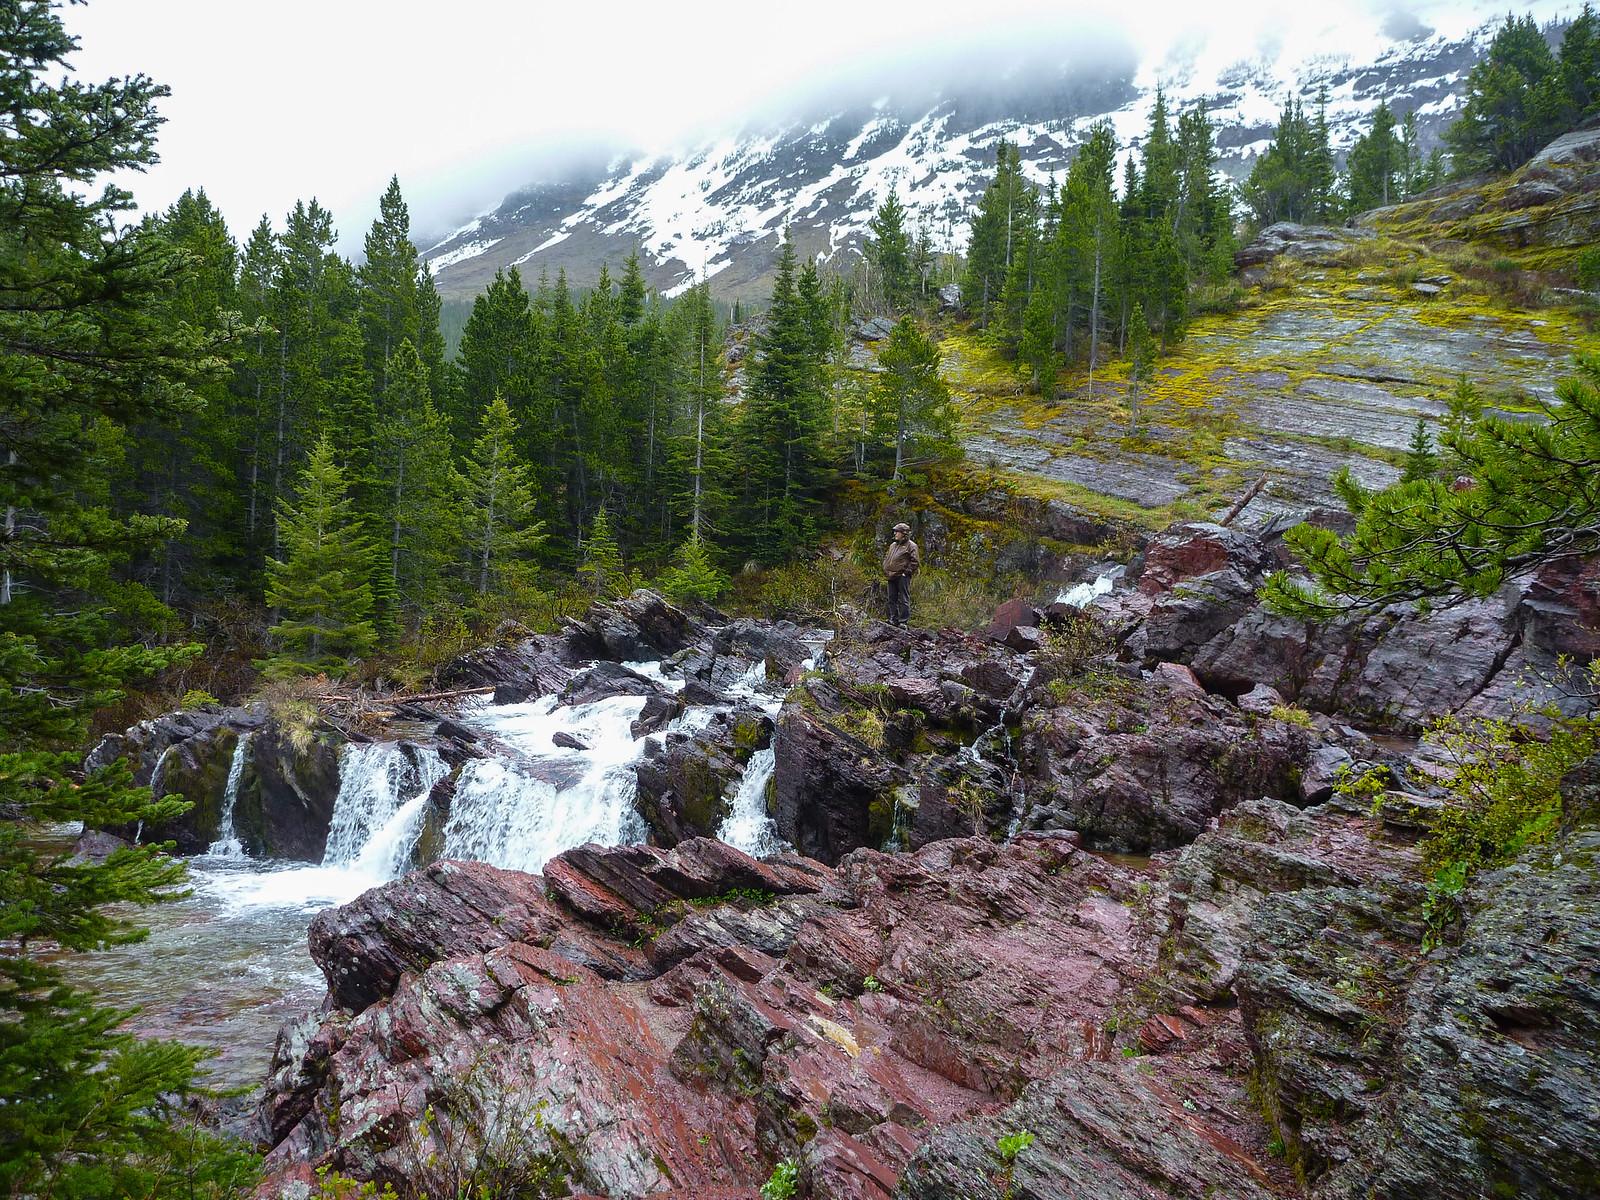 2015-05-16 Red Rock Falls -1090121.jpg